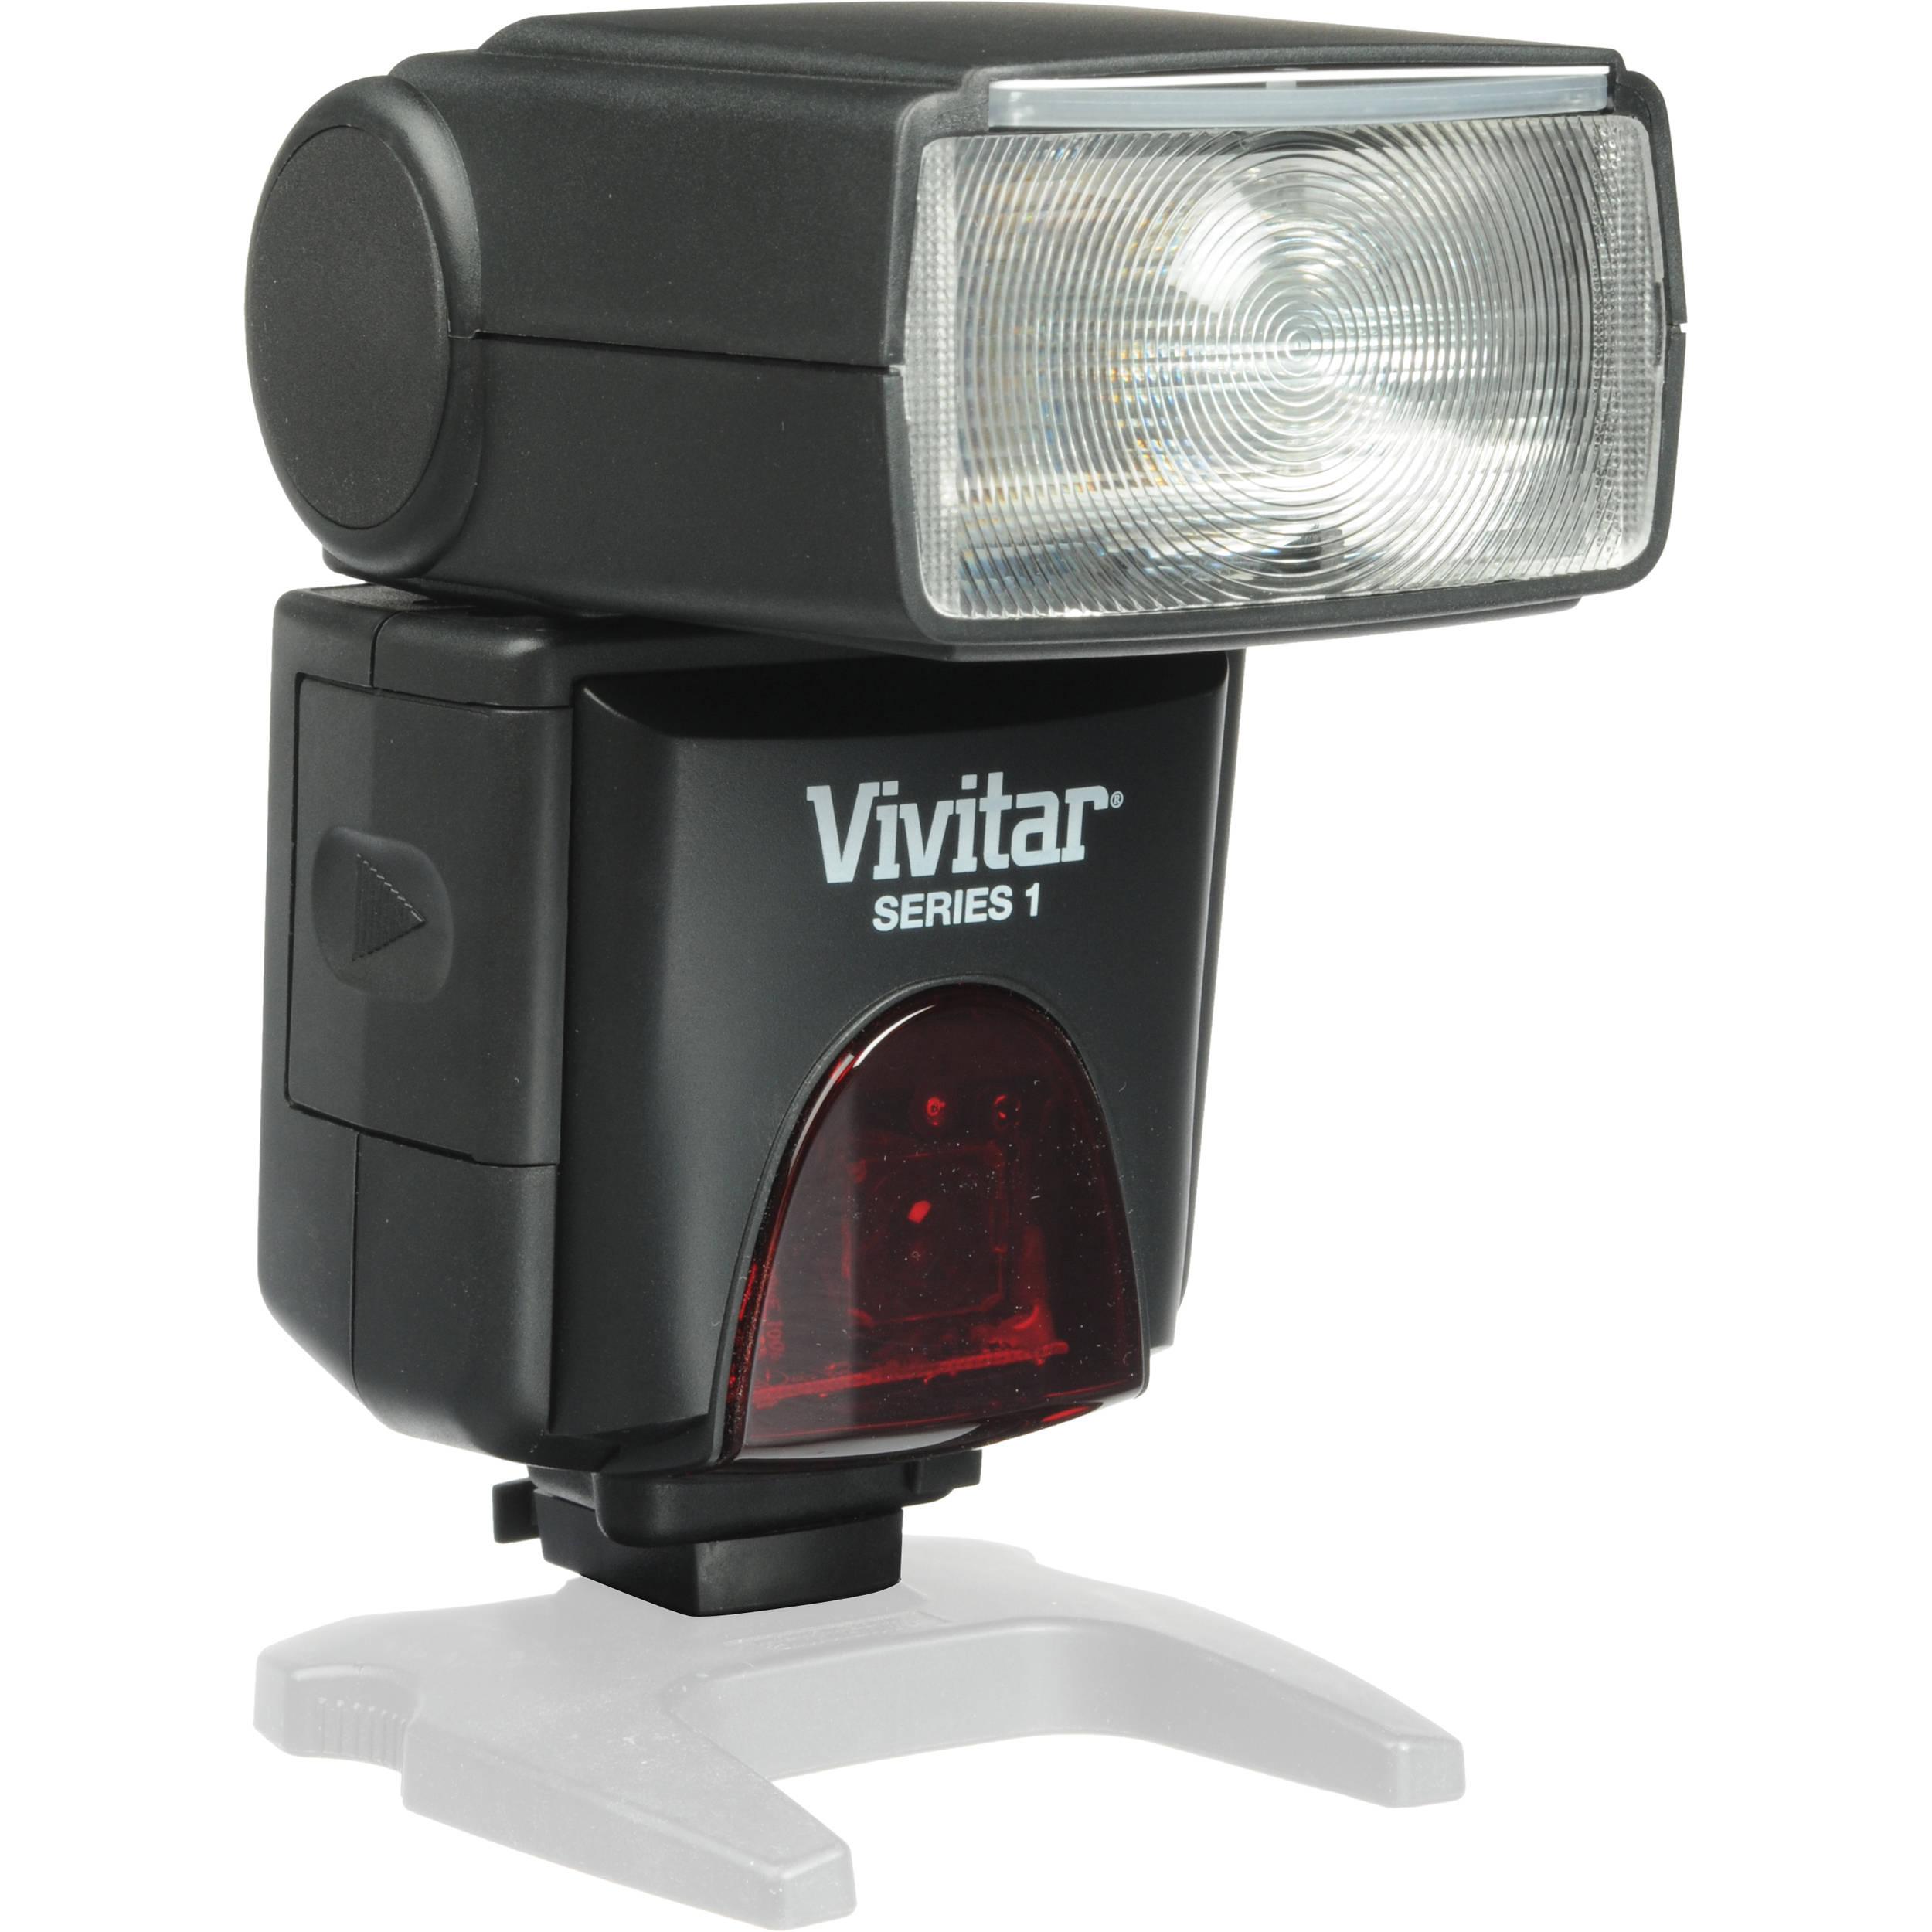 vivitar df 383 series 1 power zoom af flash for canon df 383 can rh bhphotovideo com User Documentation User Documentation